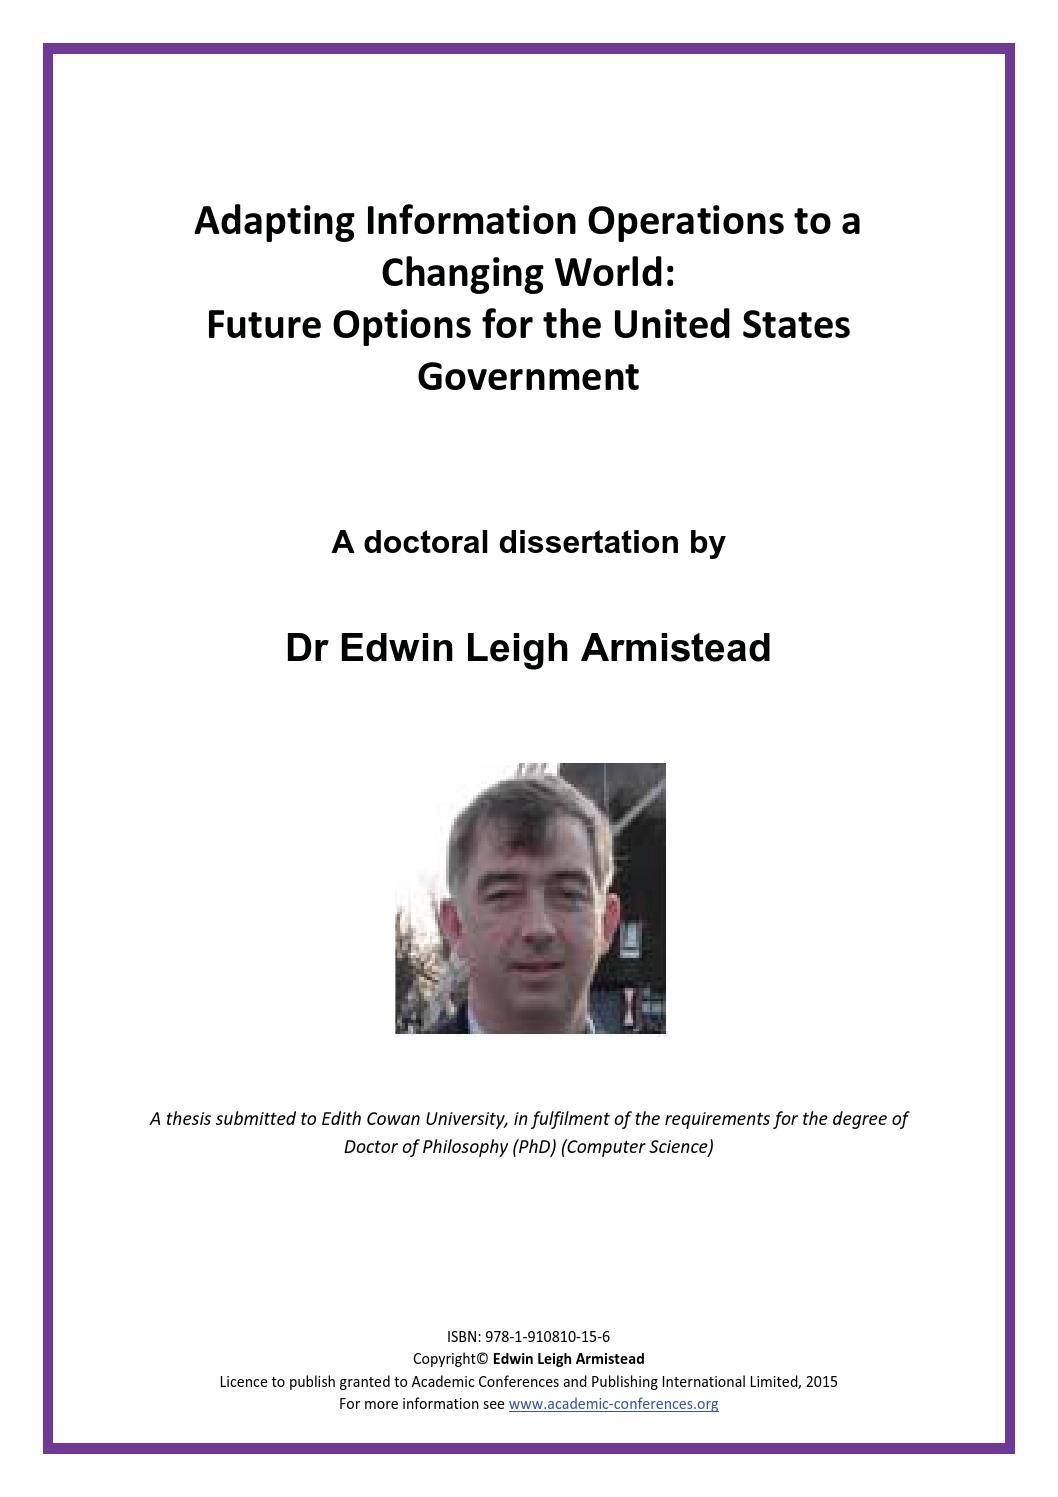 Political science phd dissertation length